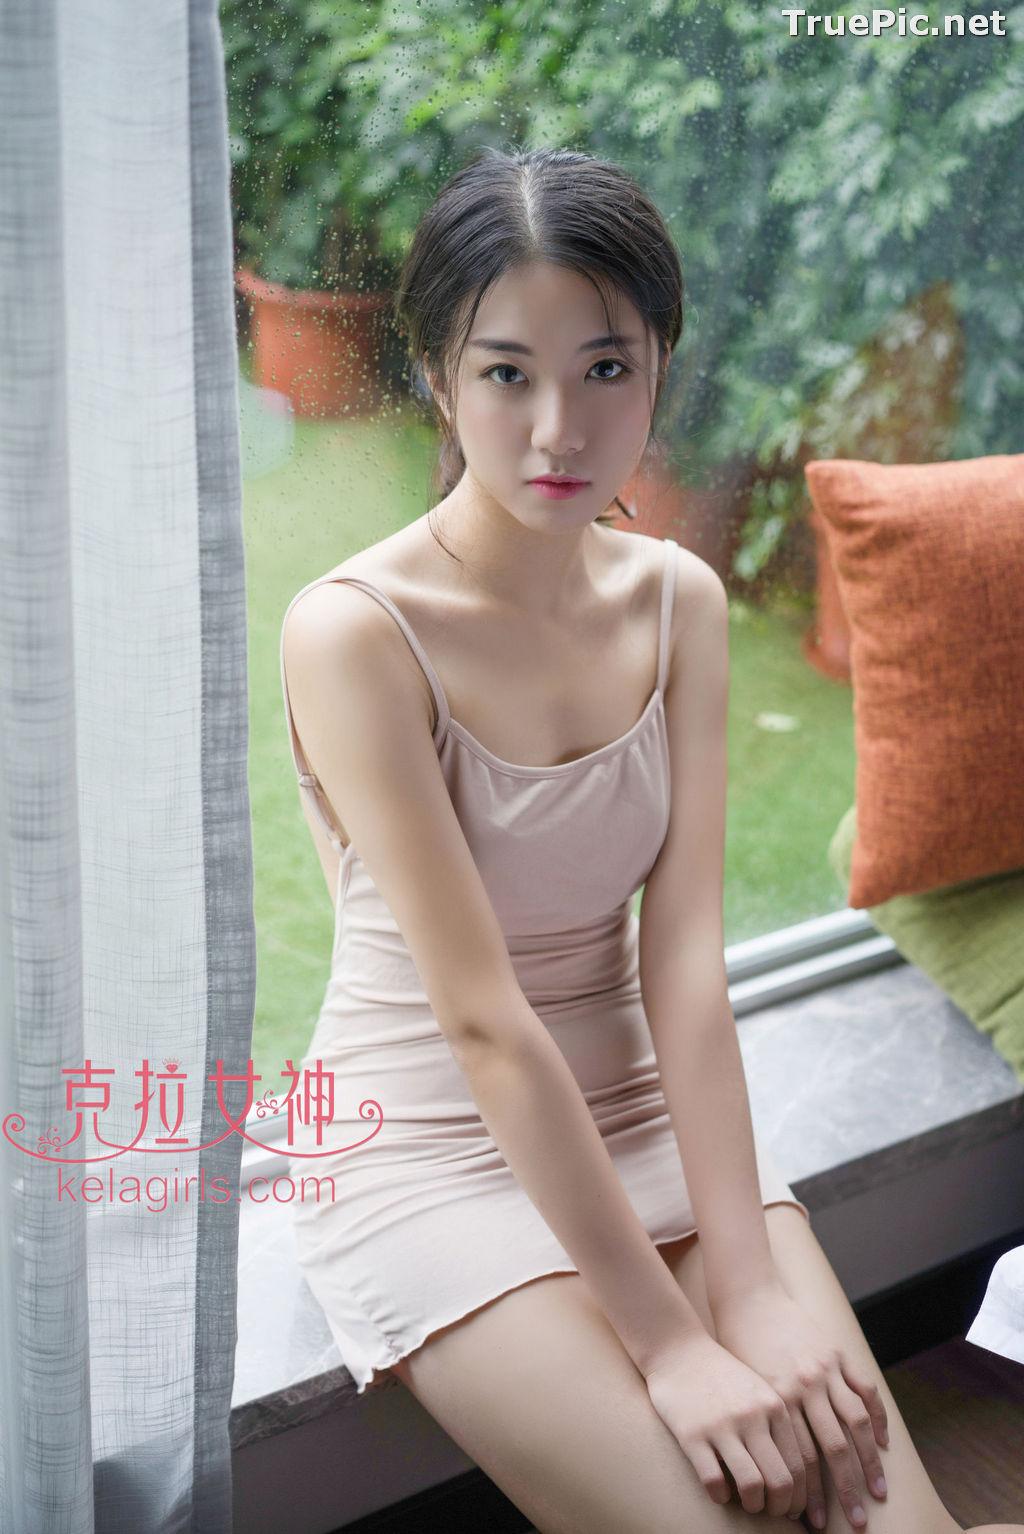 Image KelaGirls 克拉女神 – Chinese Model Ning Ning – Home School Girl Photo Album - TruePic.net - Picture-5